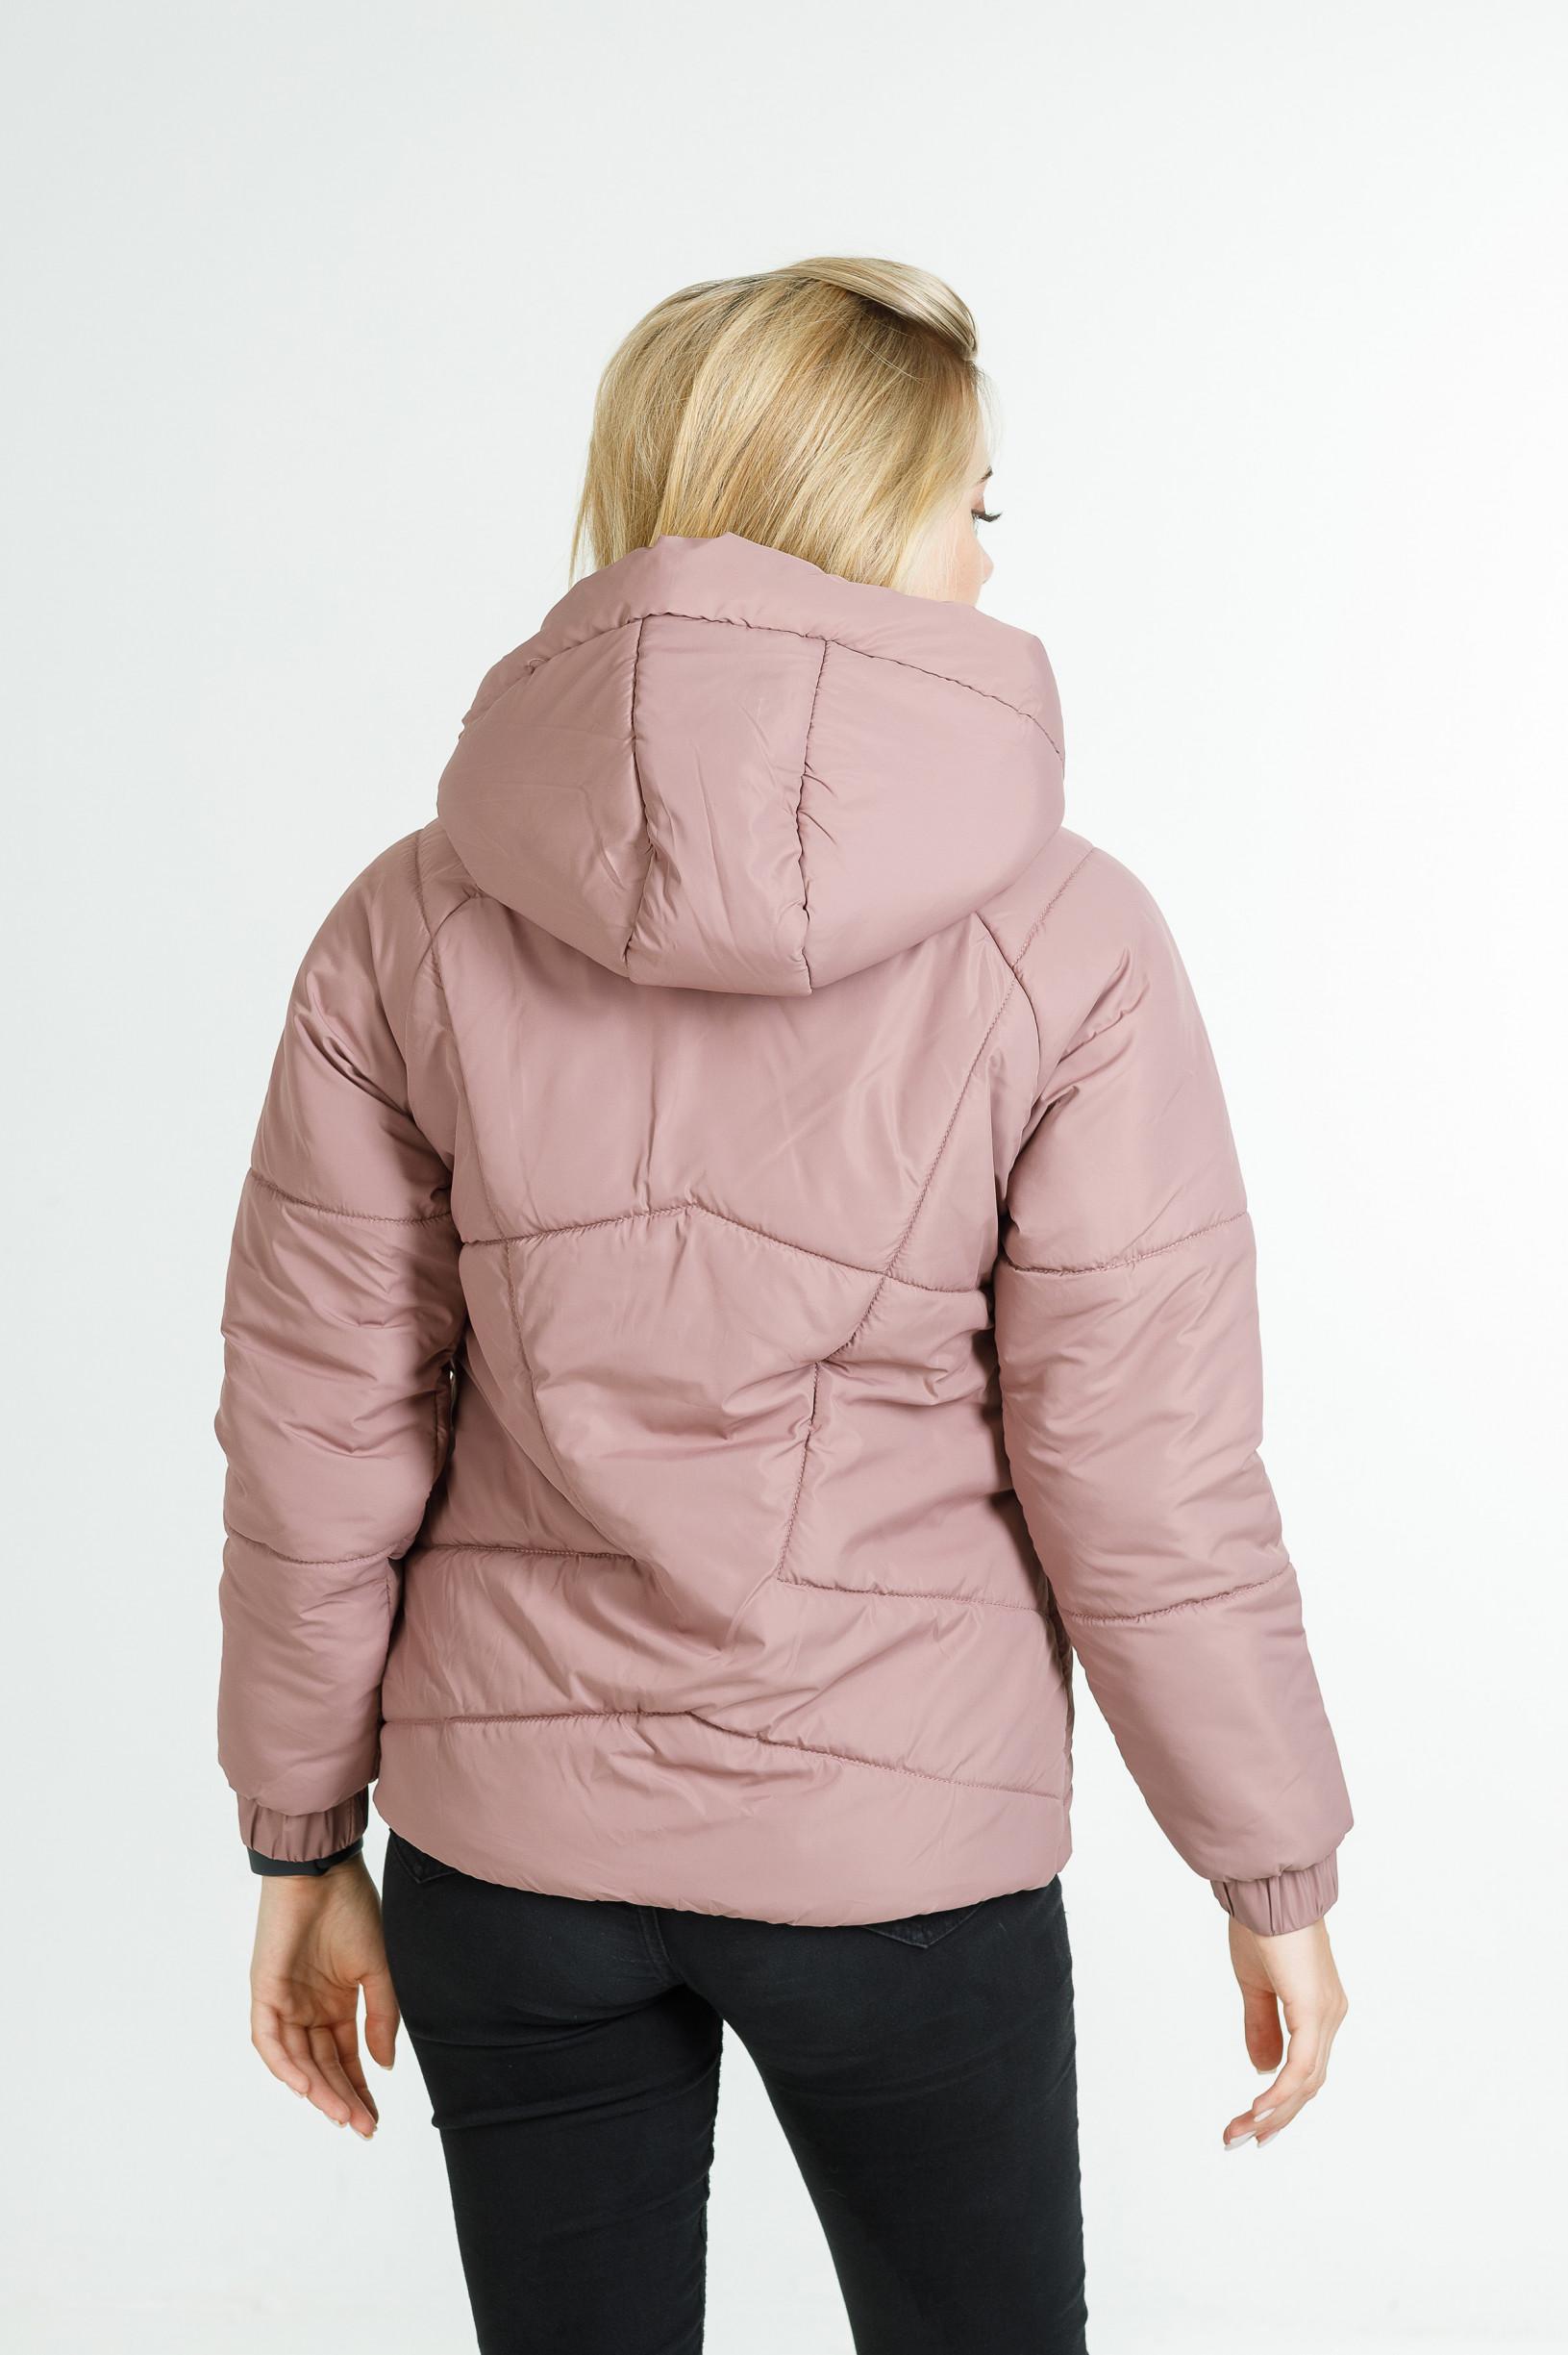 Демисезонная куртка Берри розового цвета